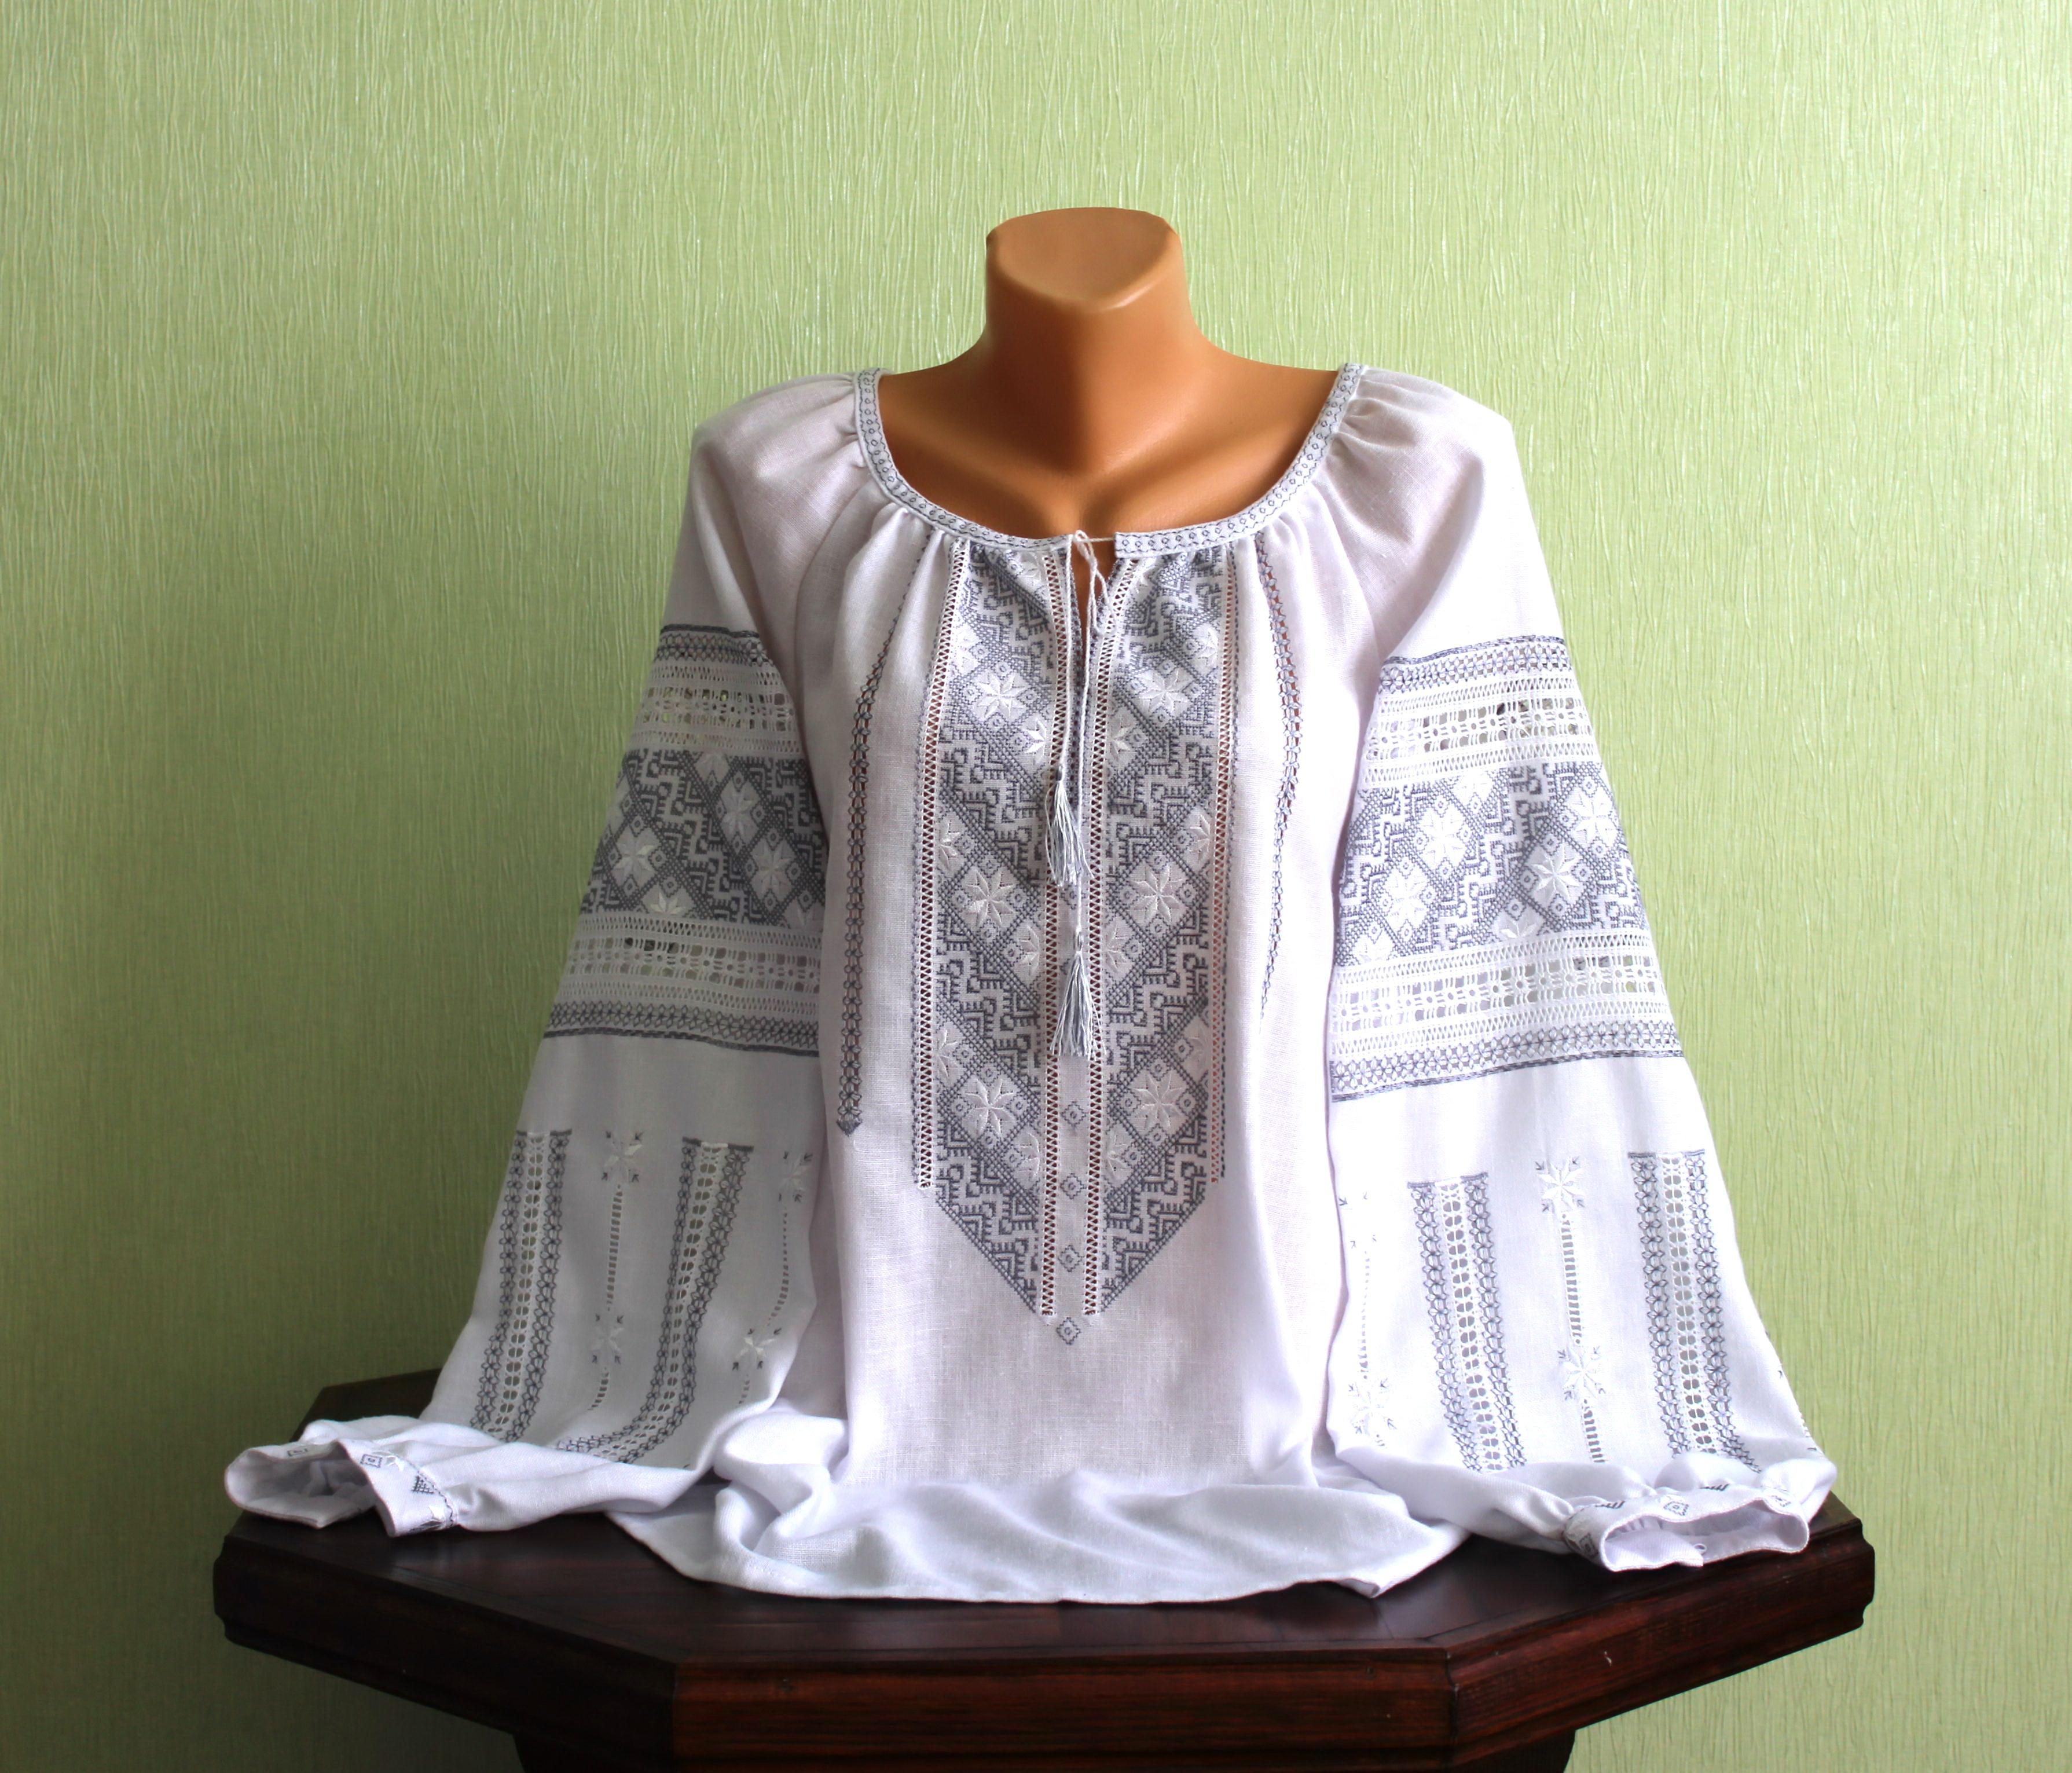 Вишукана жіноча сорочка вишита ручної роботи - Товари - Вишиванки ... 8c0f6e273e2cc